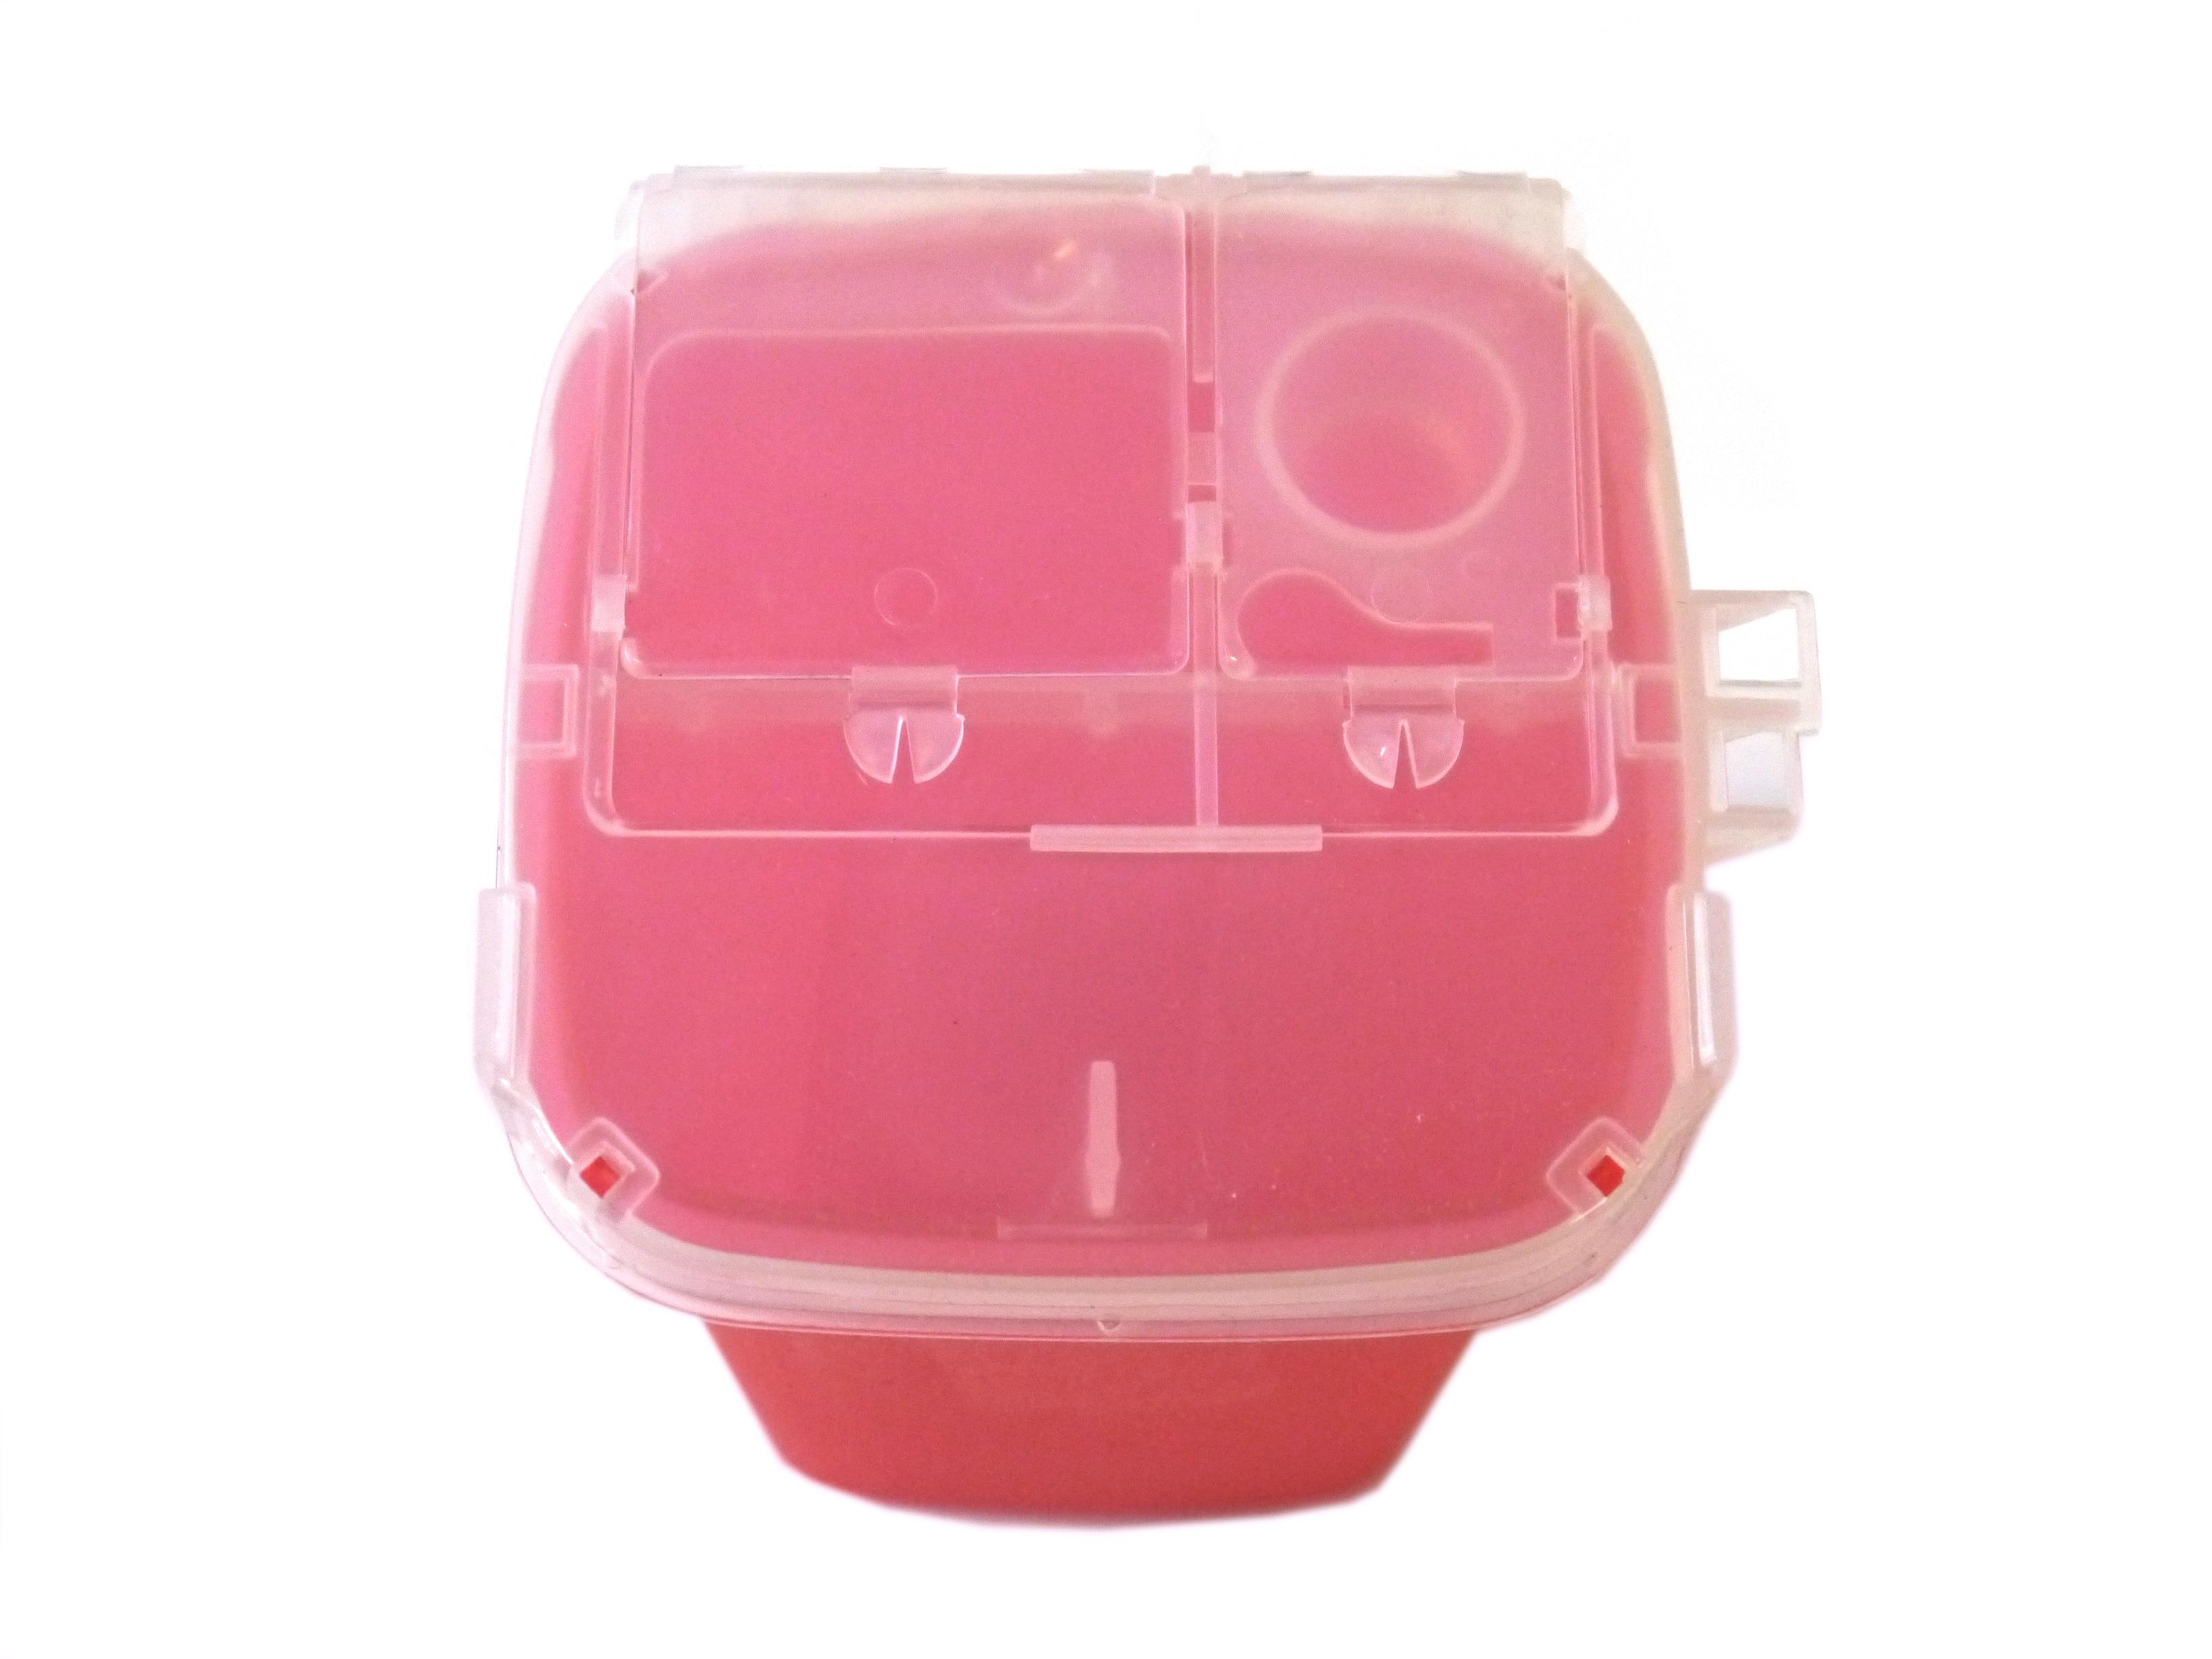 permanent makeup sharps container 1qt 1